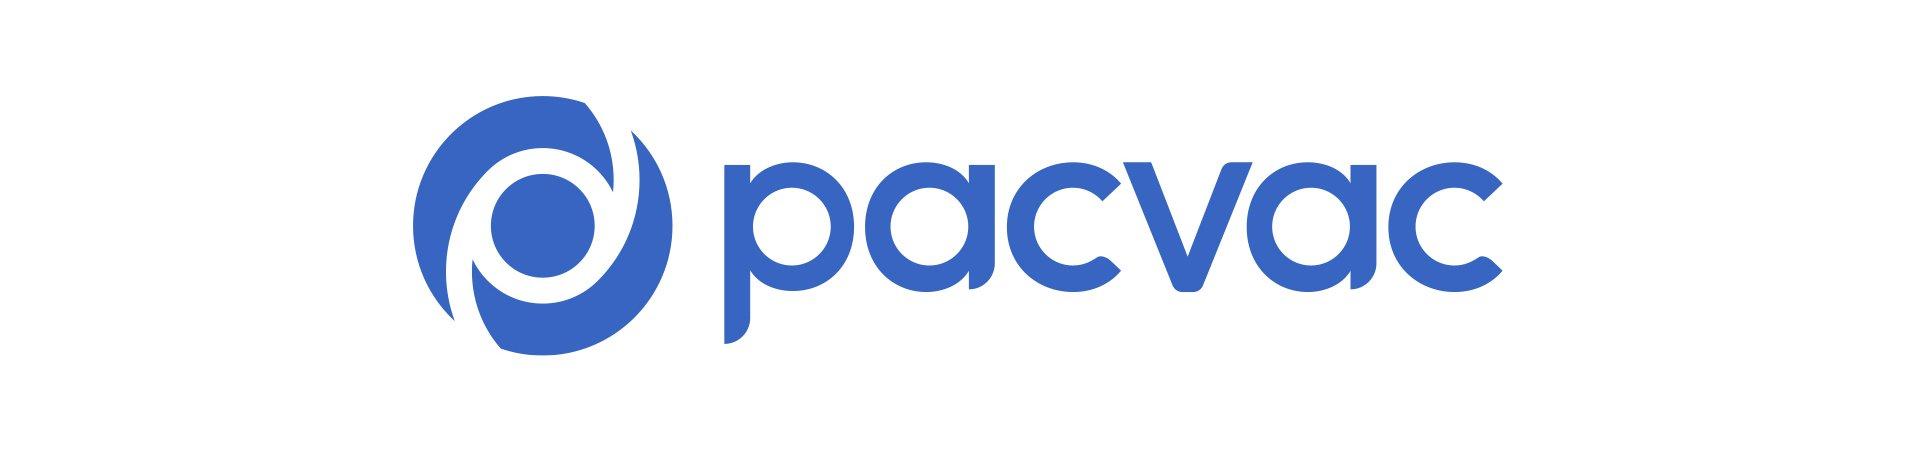 Pacvac Velo